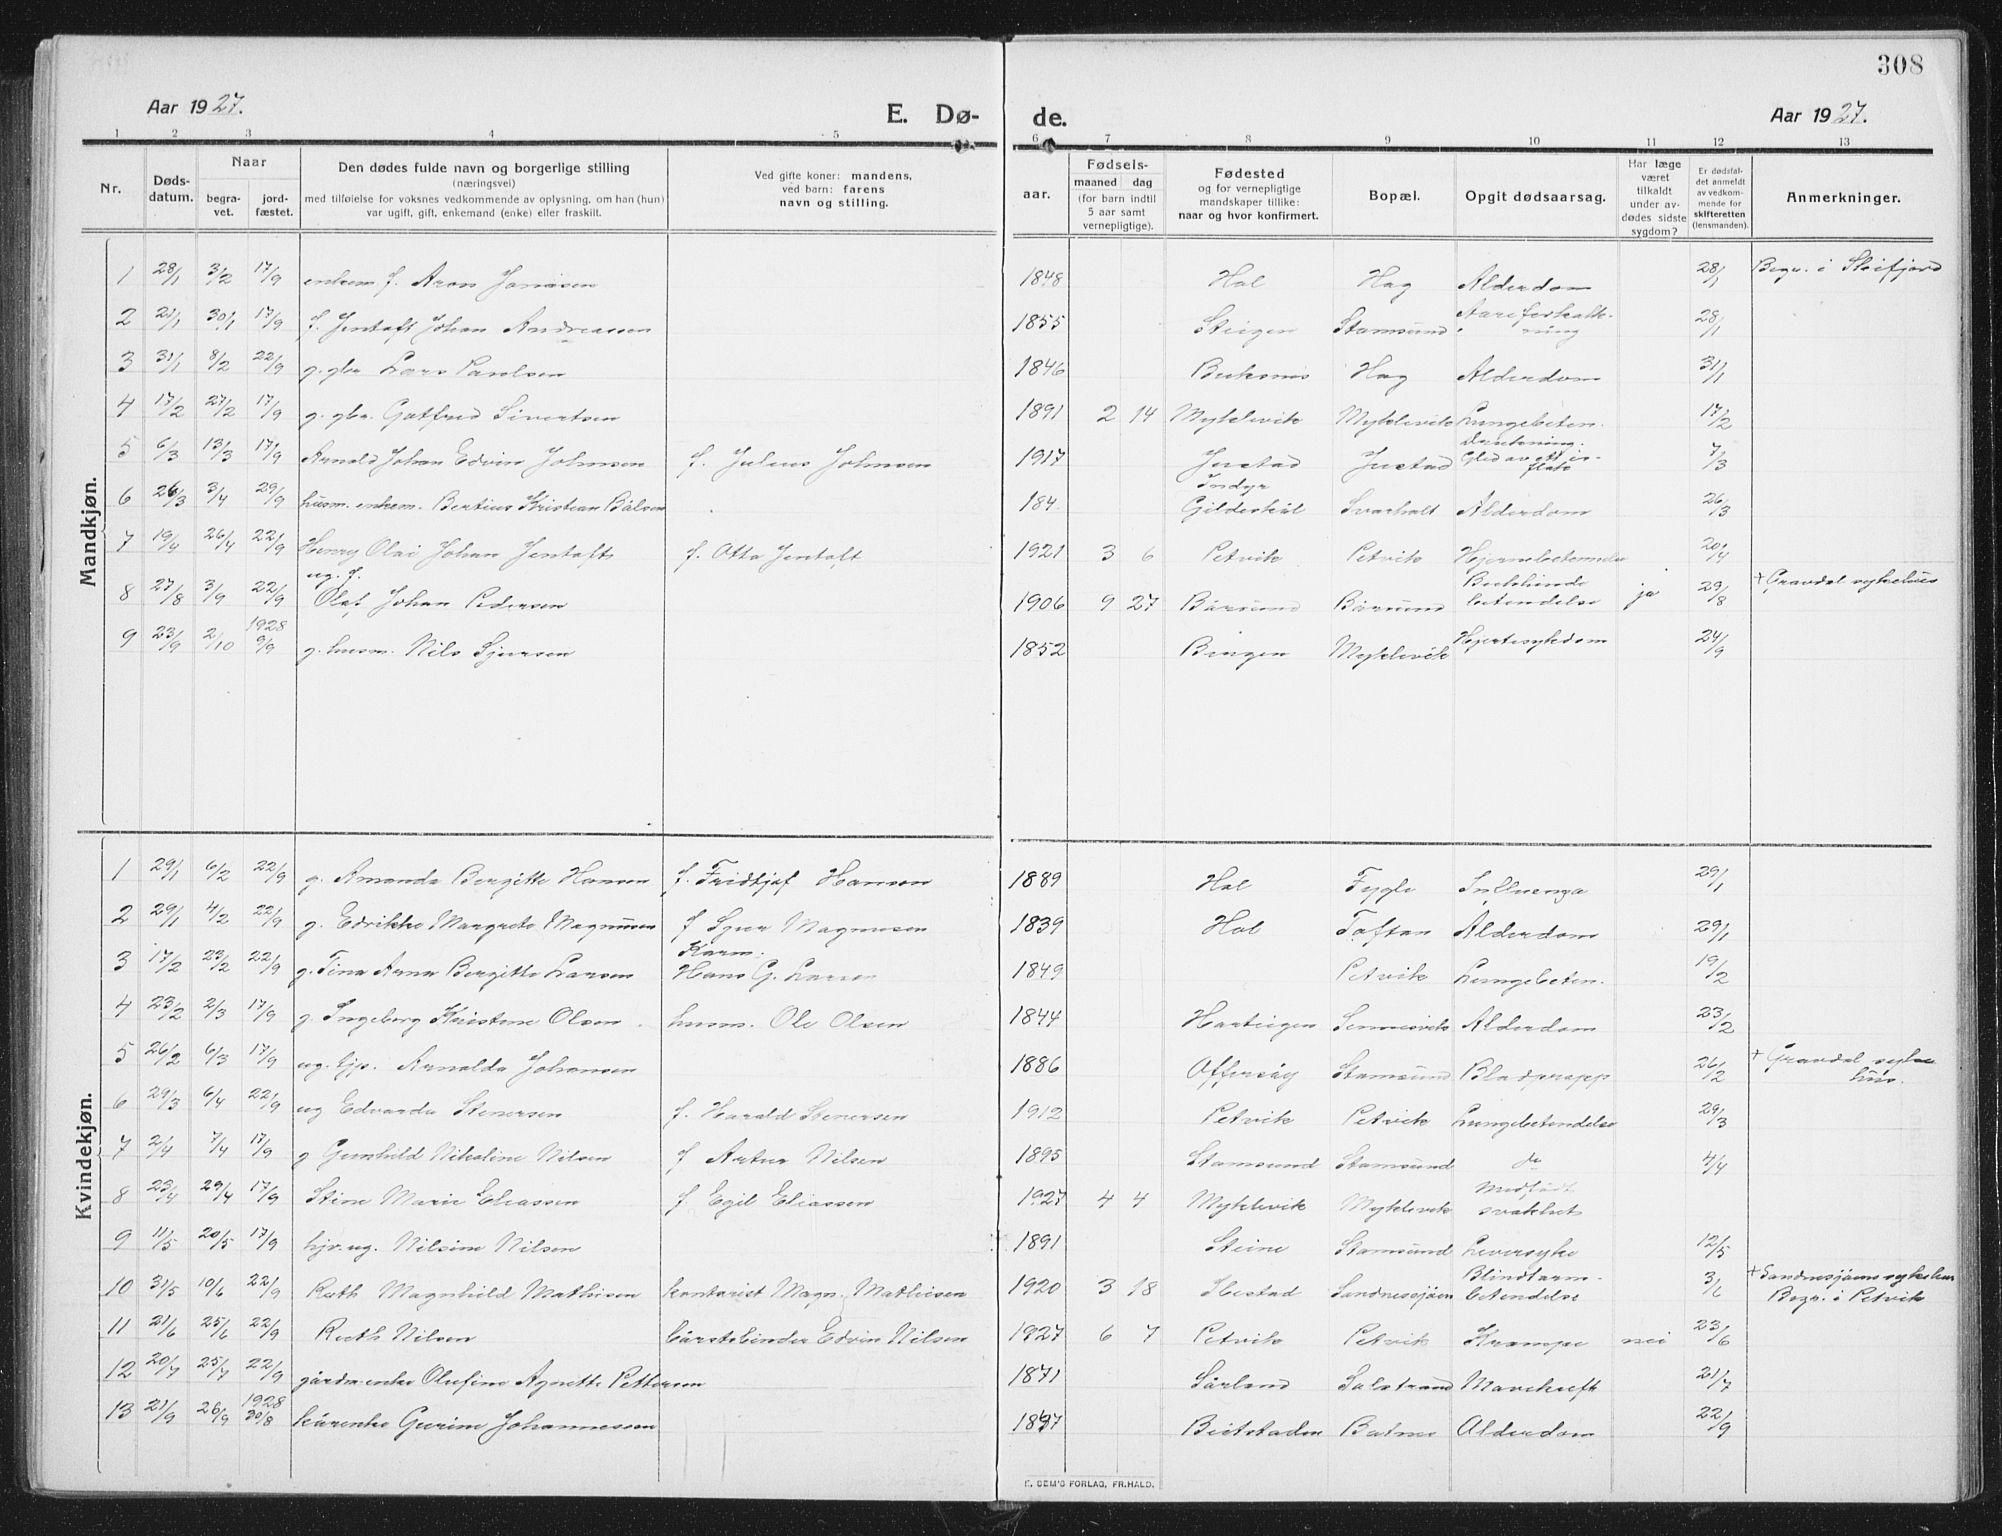 SAT, Ministerialprotokoller, klokkerbøker og fødselsregistre - Nordland, 882/L1183: Klokkerbok nr. 882C01, 1911-1938, s. 308